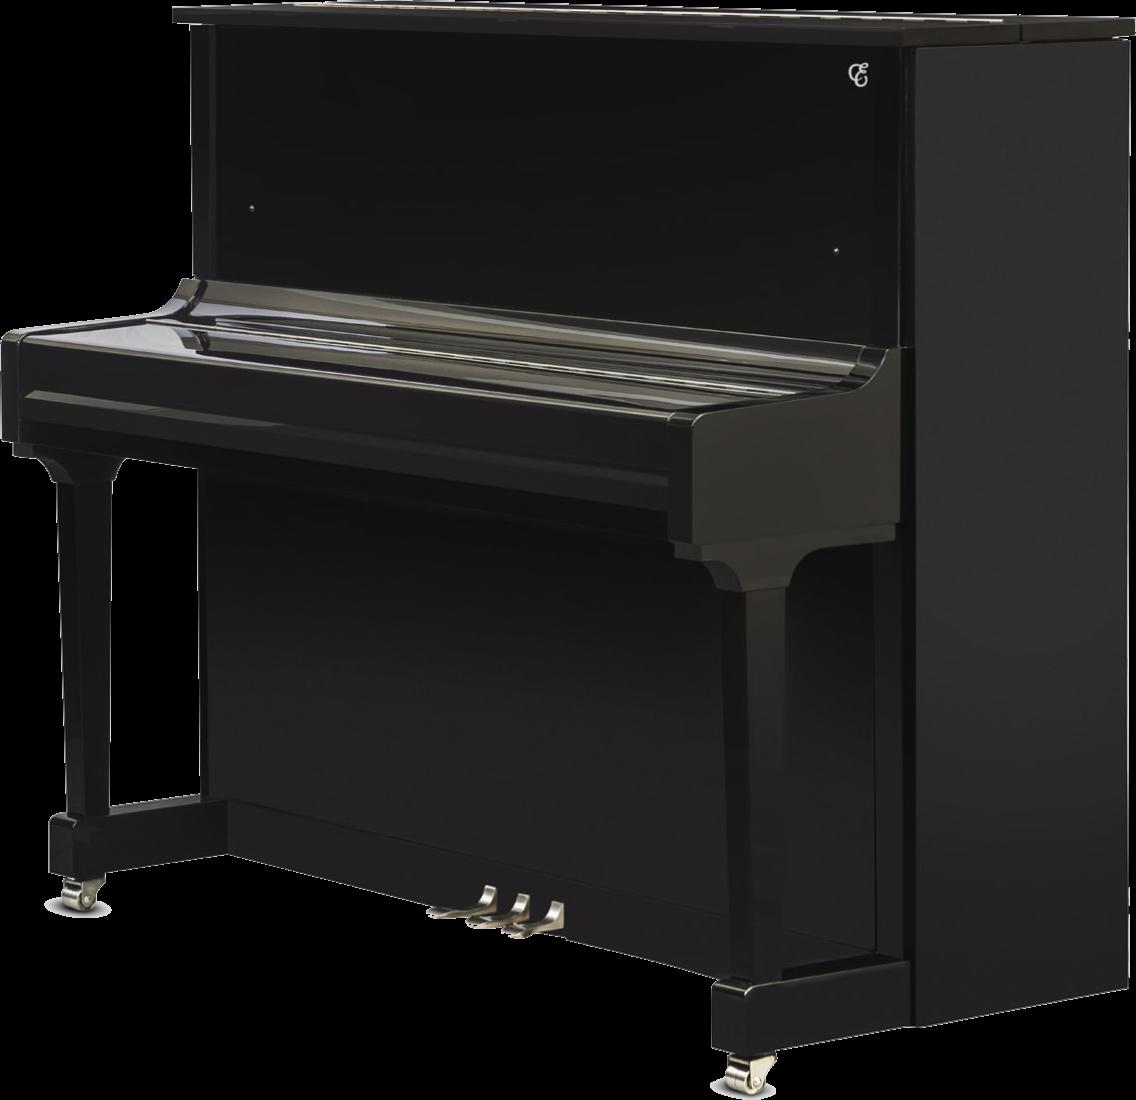 piano-vertical-essex-eup123-chrome-nuevo-negro-plata-frontal-03